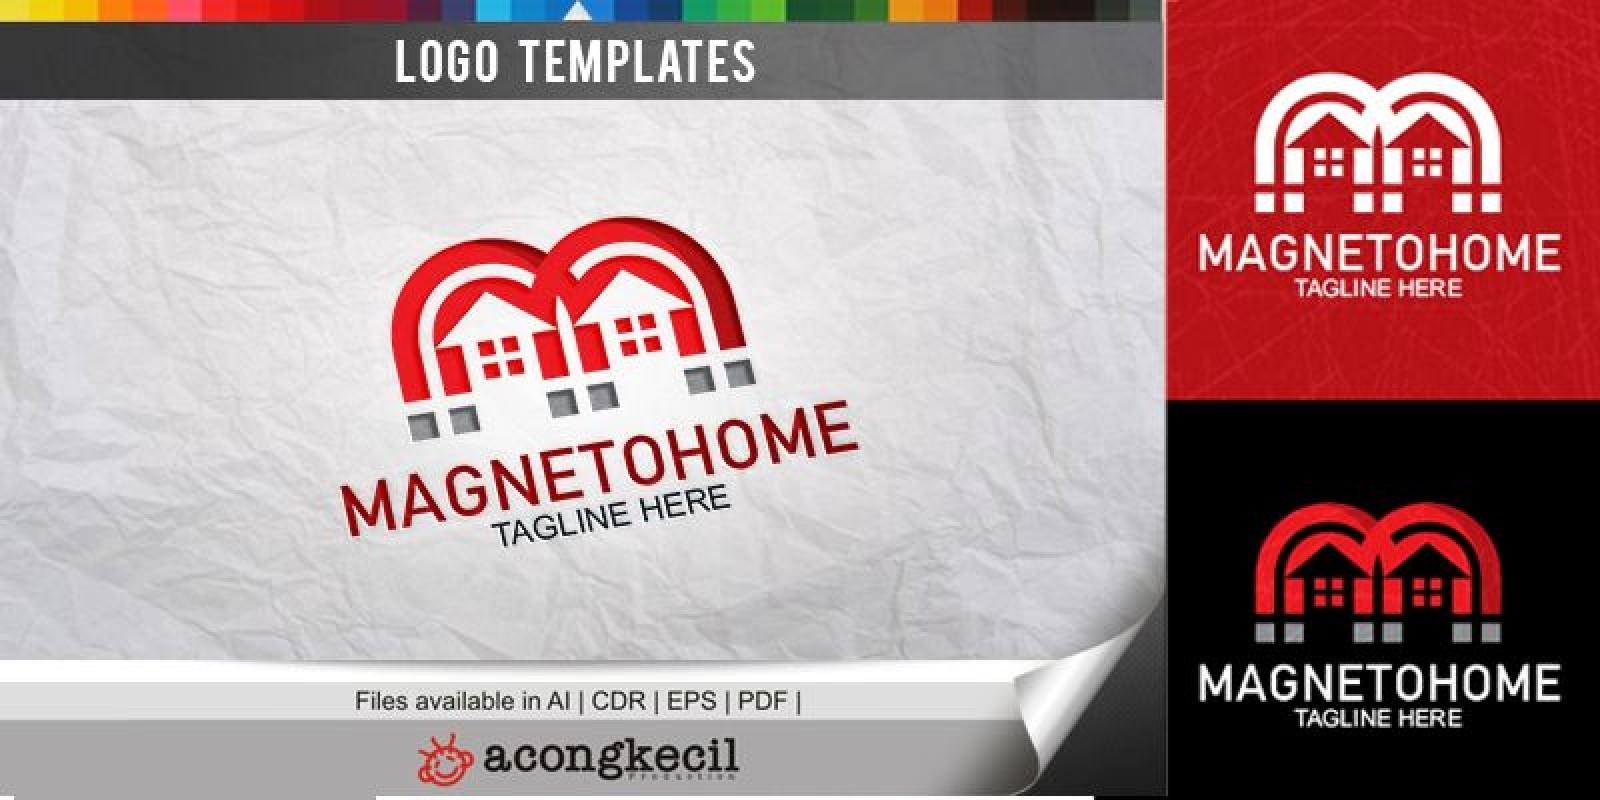 Magneto Home - Logo Template